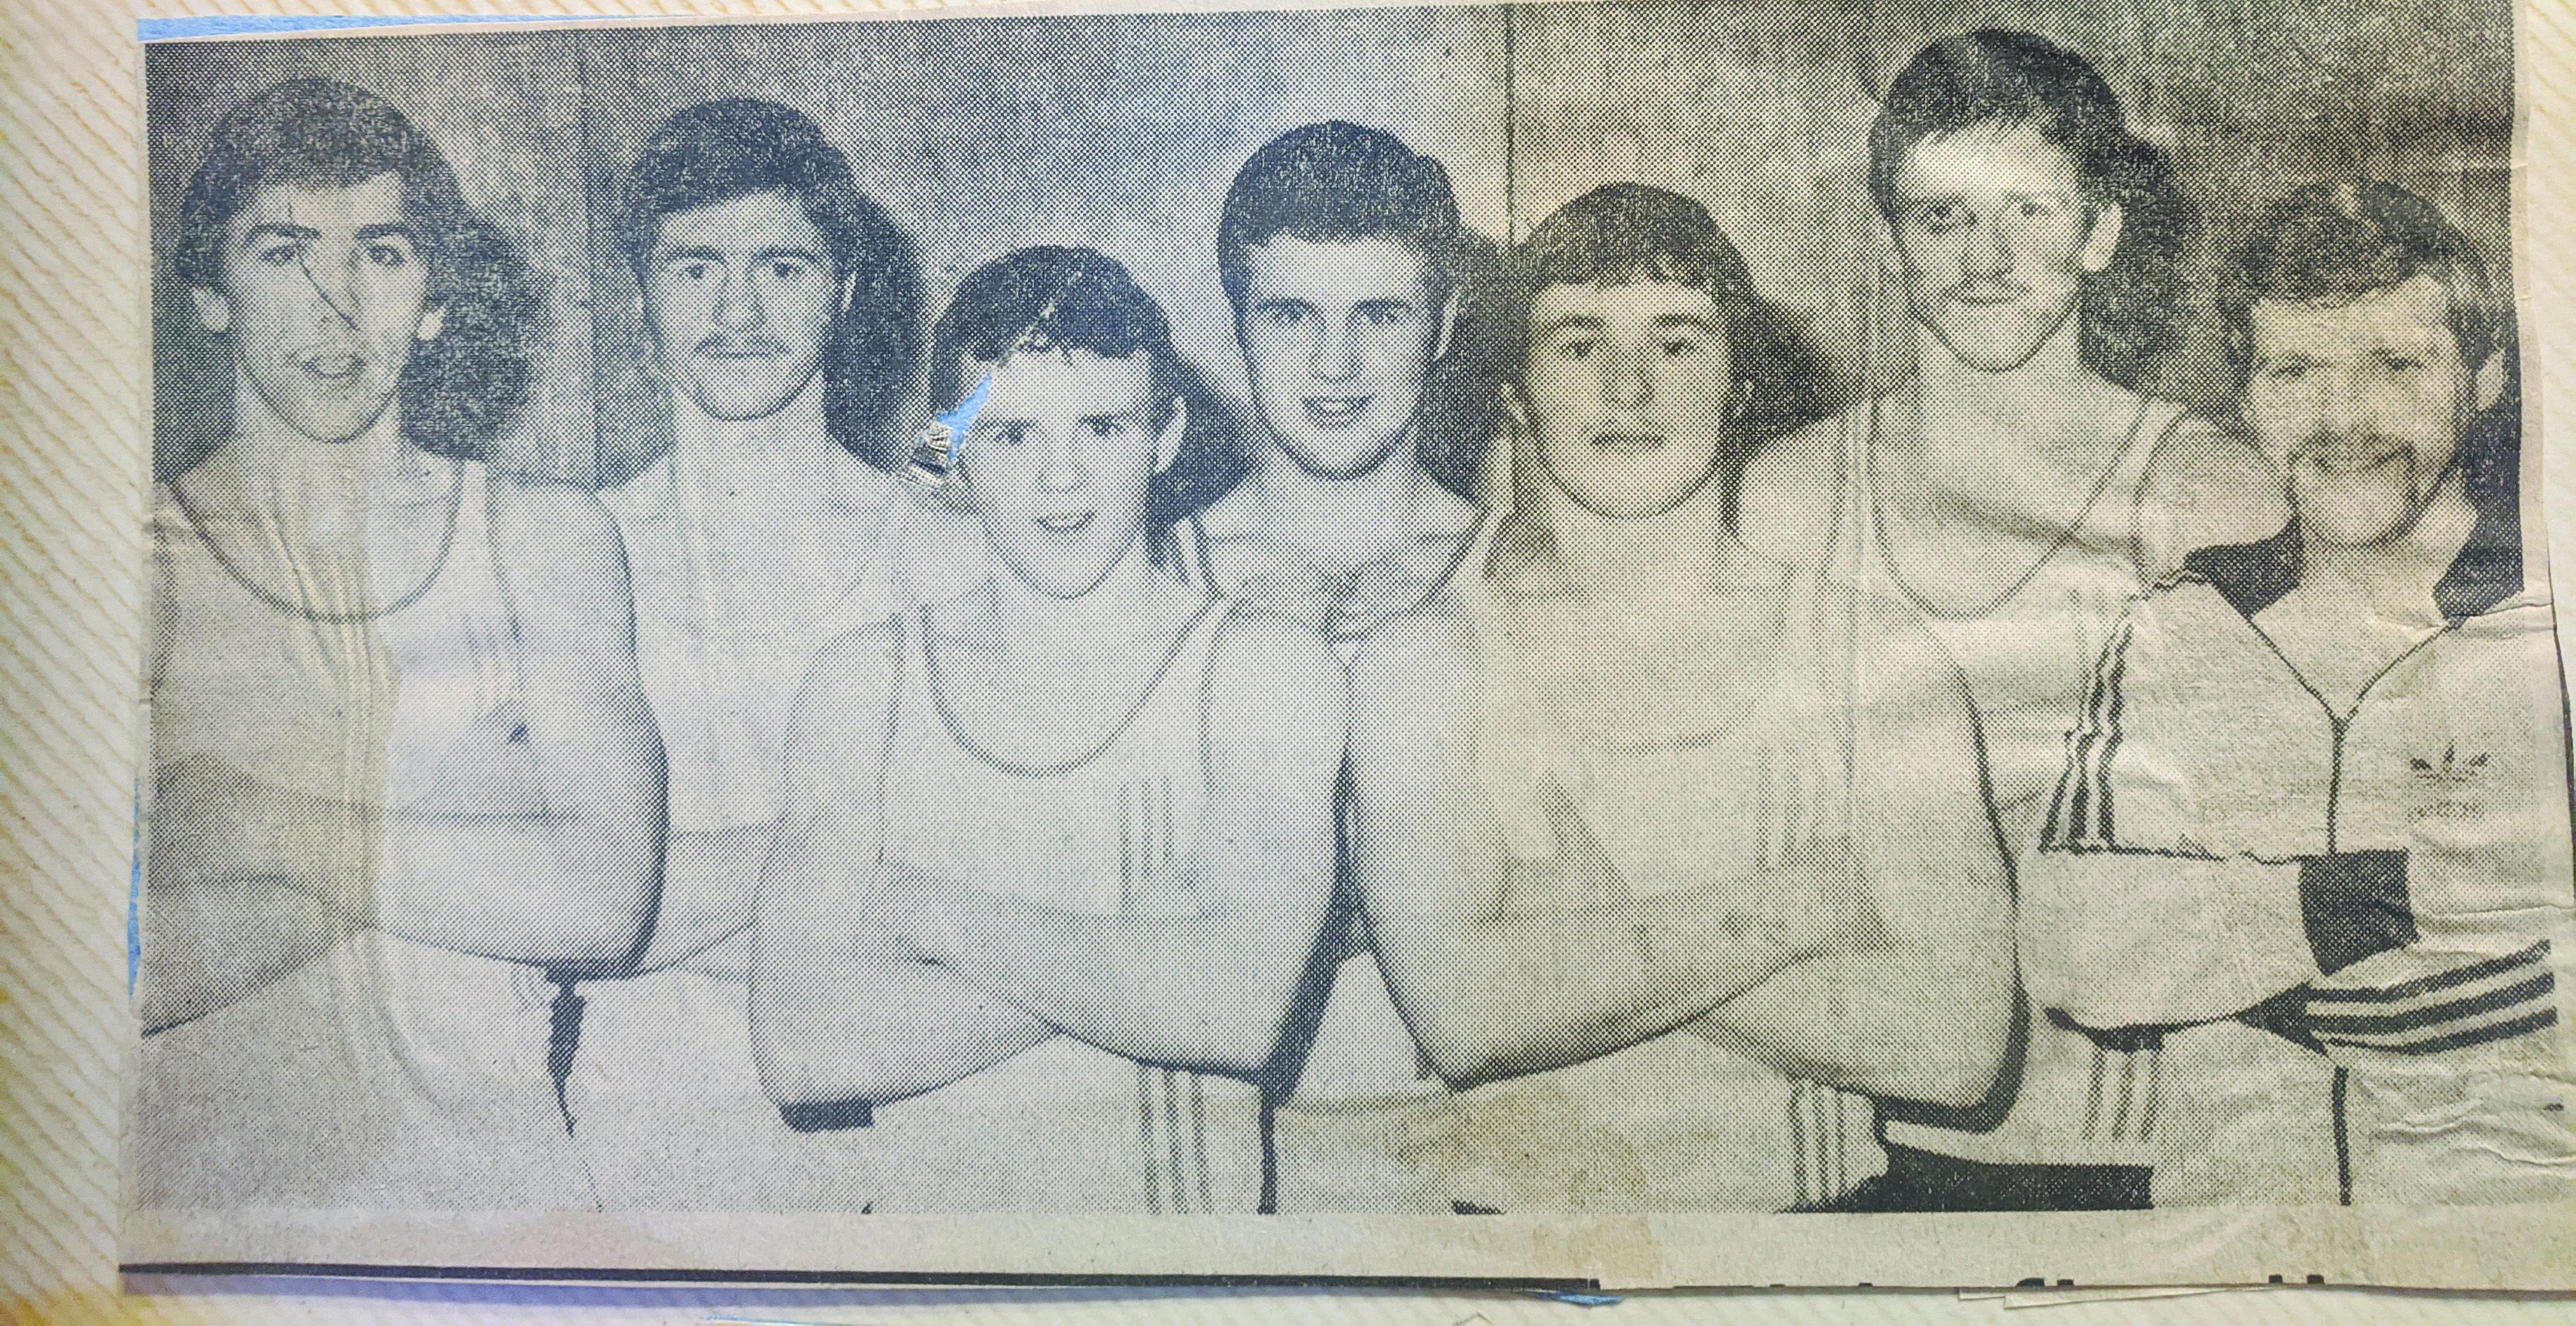 David Irvine, Douglas Adams (formerly Corpus Christi, Cecil\'s son), Gerard Hawkins, Raymond Bell (formerly Corpus Christi), Damien Fryers, Micheal Moylan and Michael Hawkins